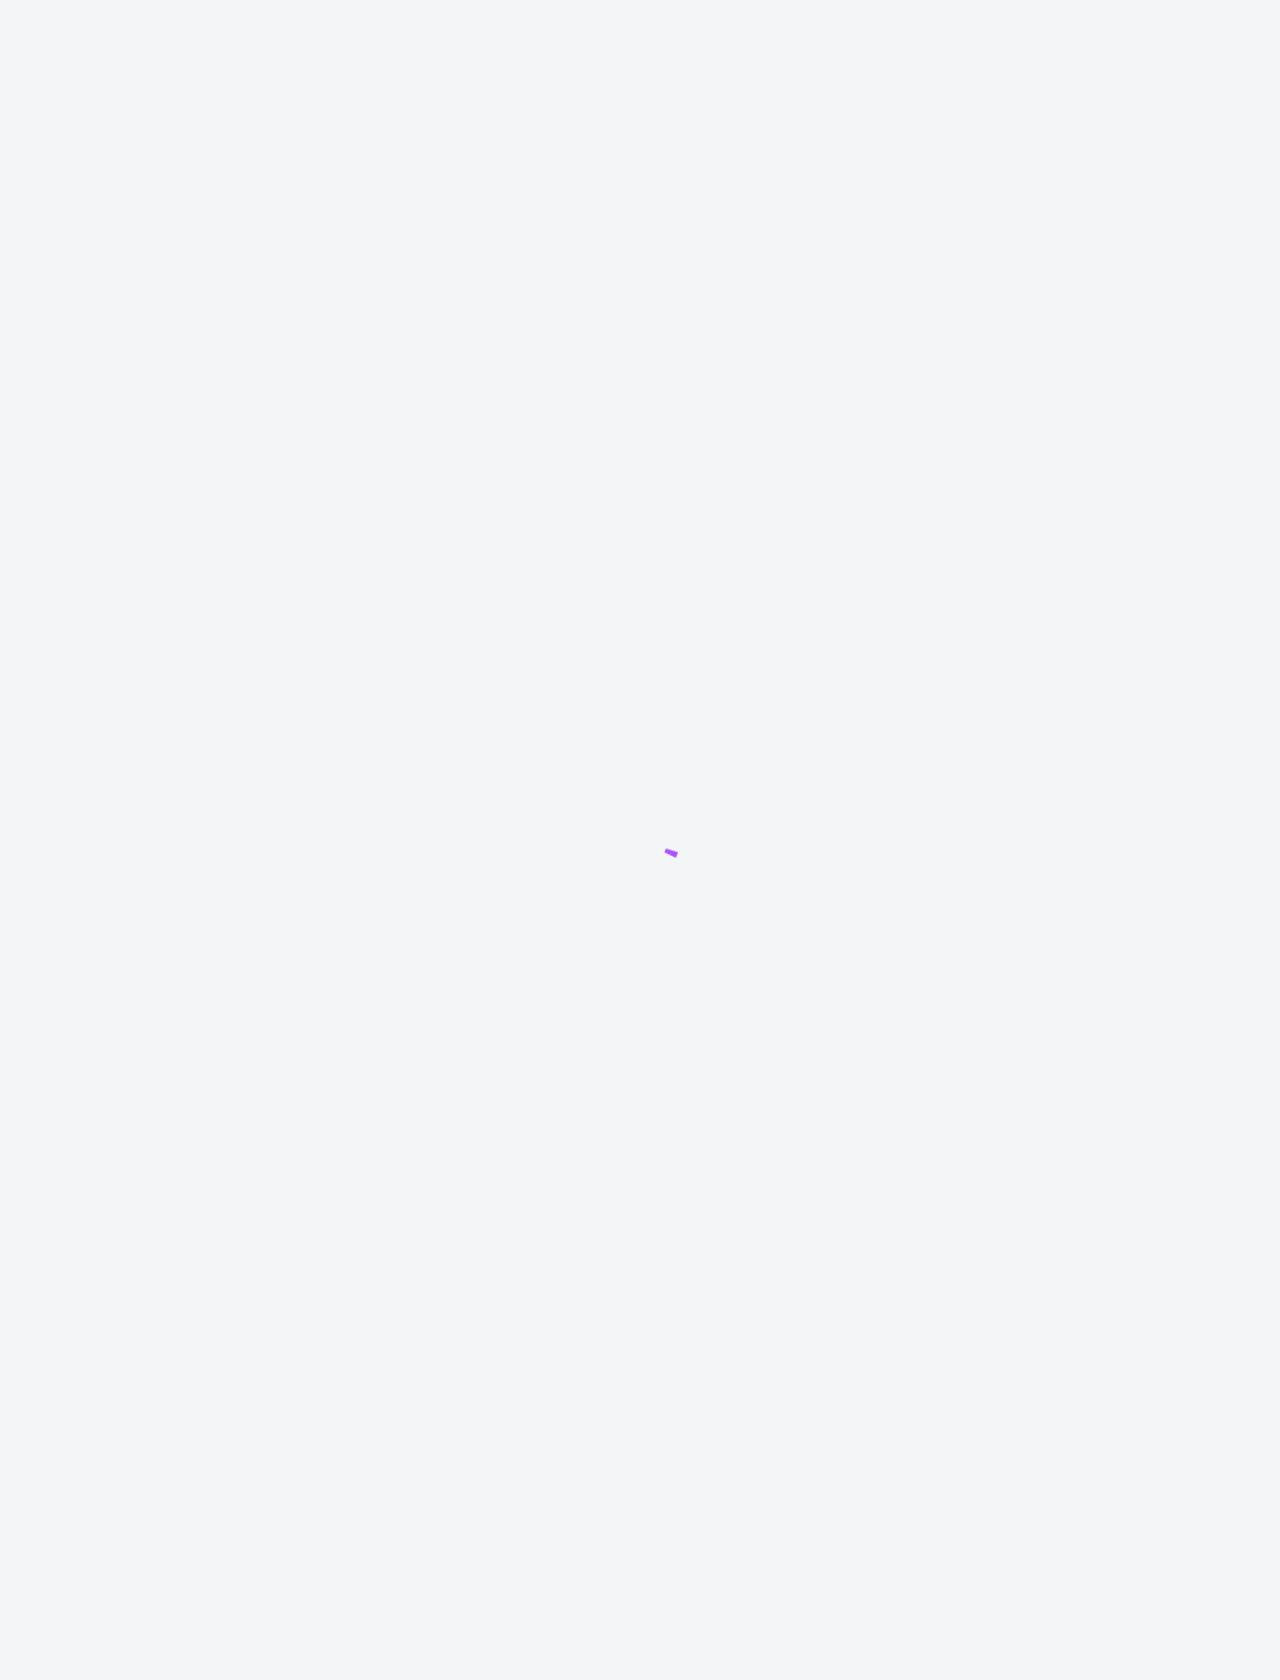 Screenshot Desktop - https://illudy.com/signin